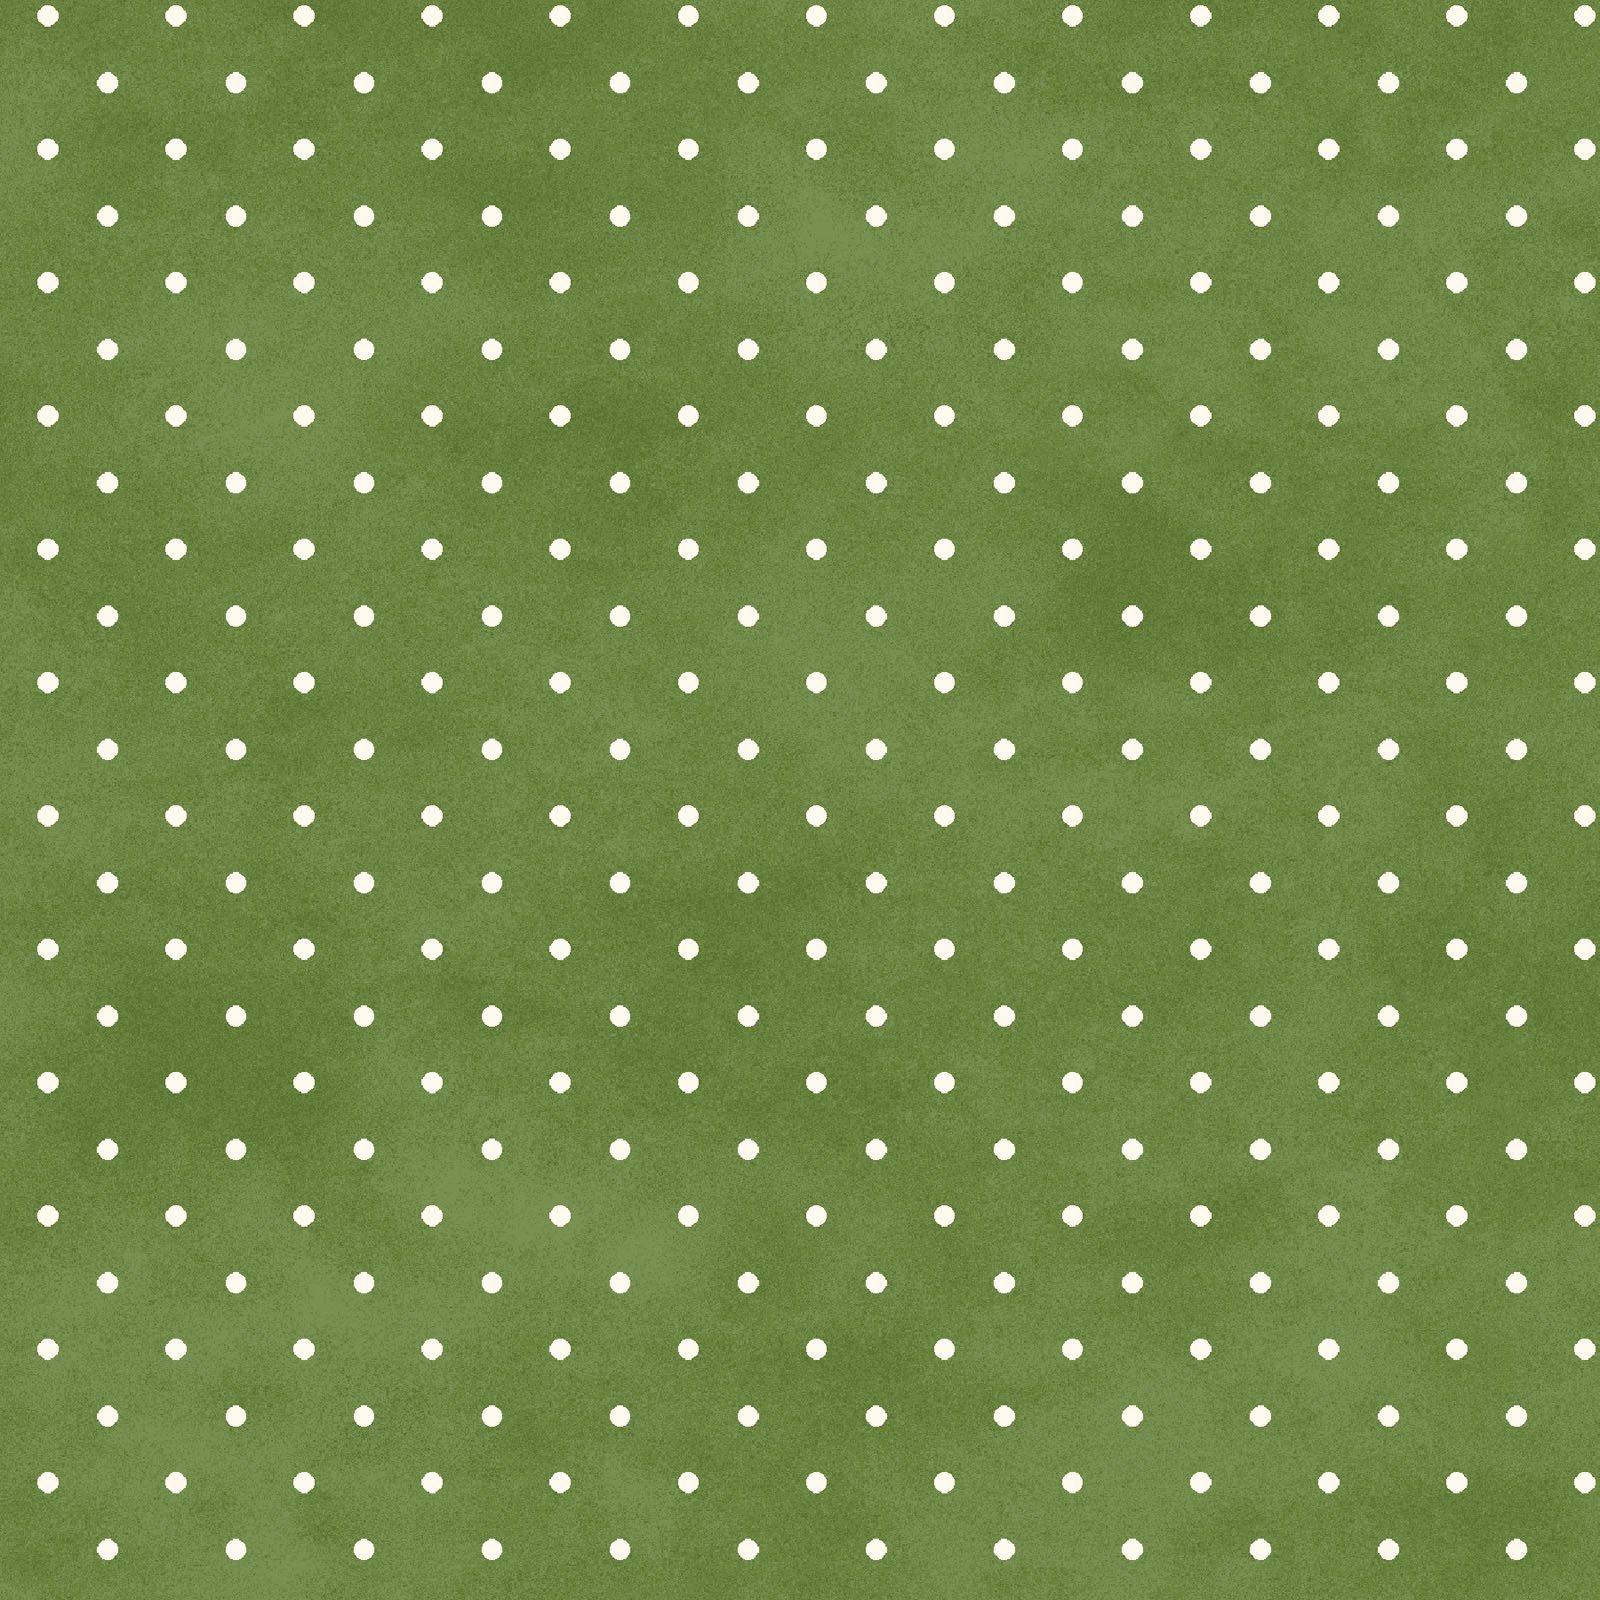 Classic Dots Yardage